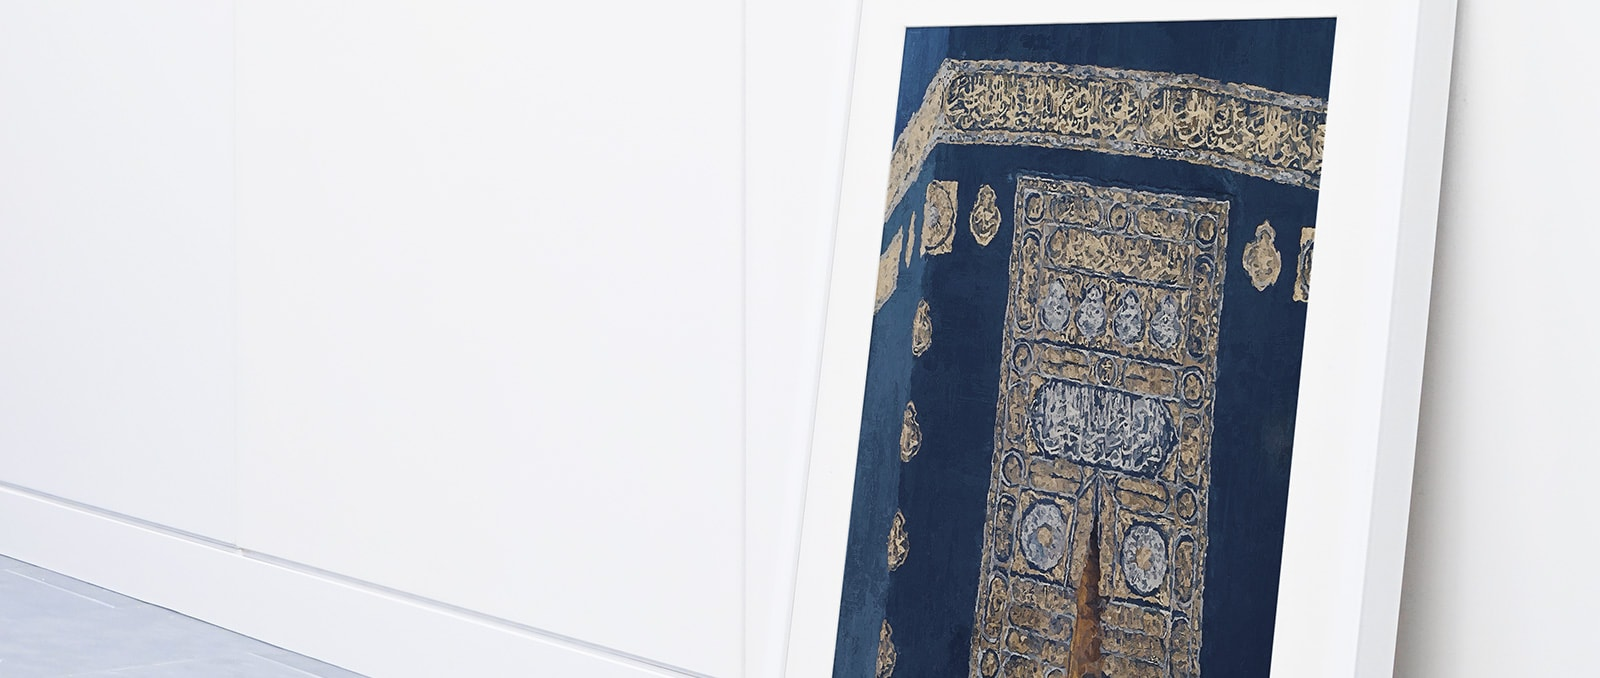 frontpage-mecca-doors